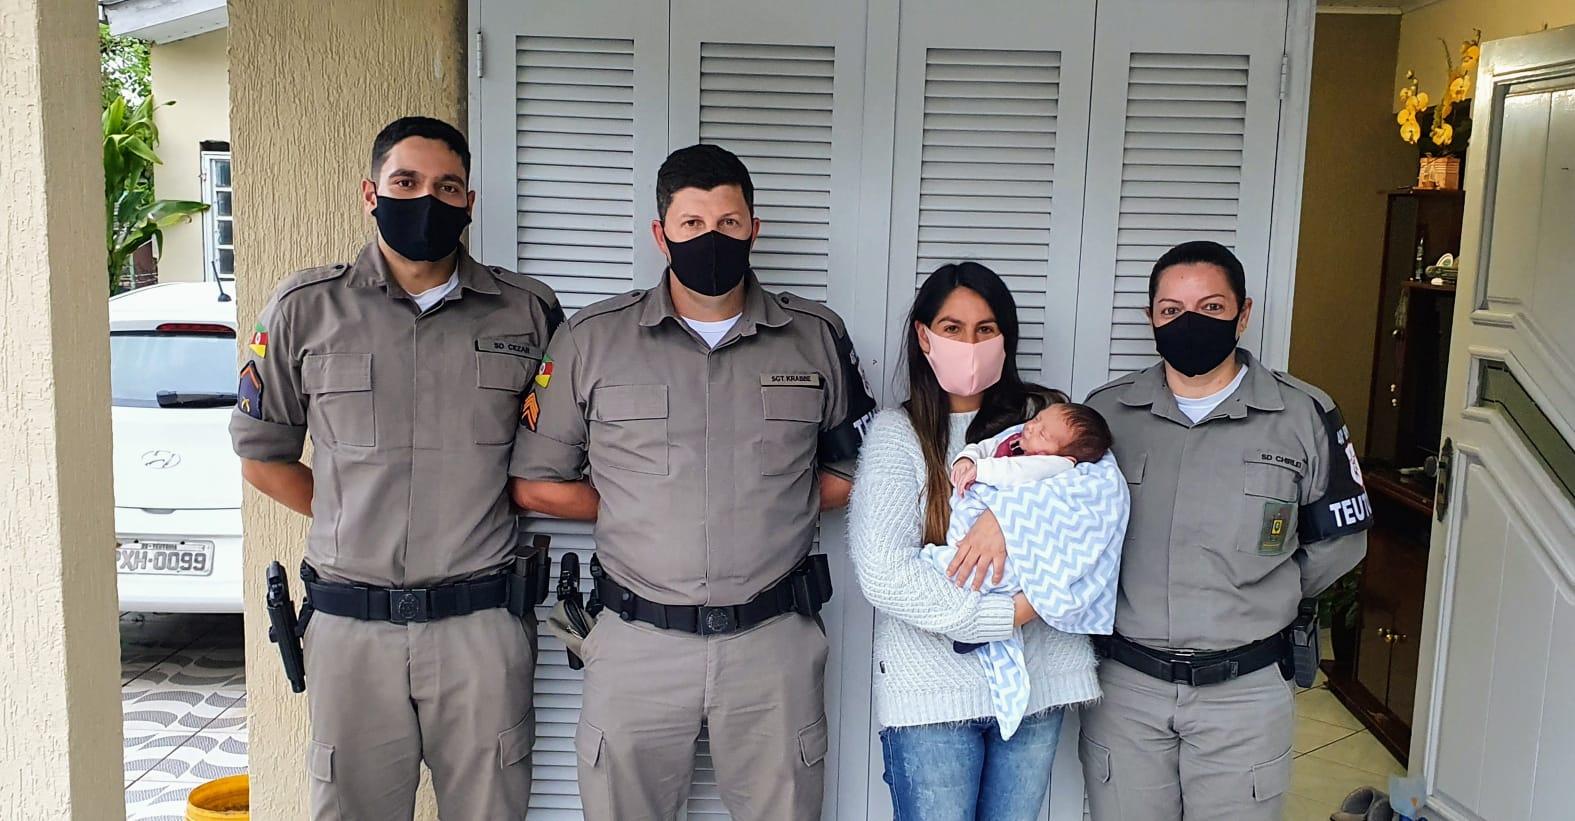 BM de Teutônia salva bebê engasgado